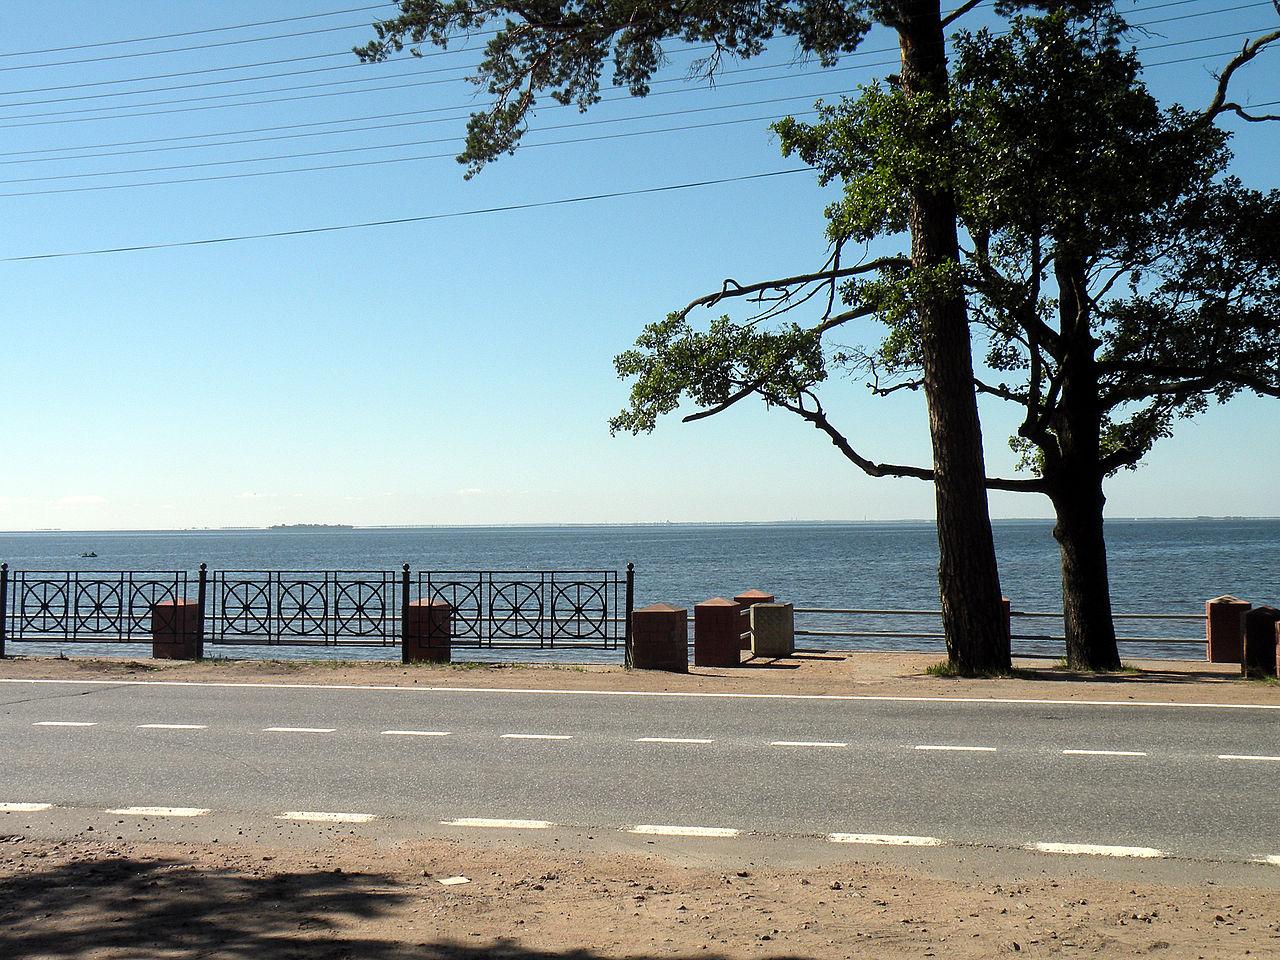 Вид на форт Тотлебен с Приморского шоссе. Автор фото: Витольд Муратов (Wikimedia Commons)